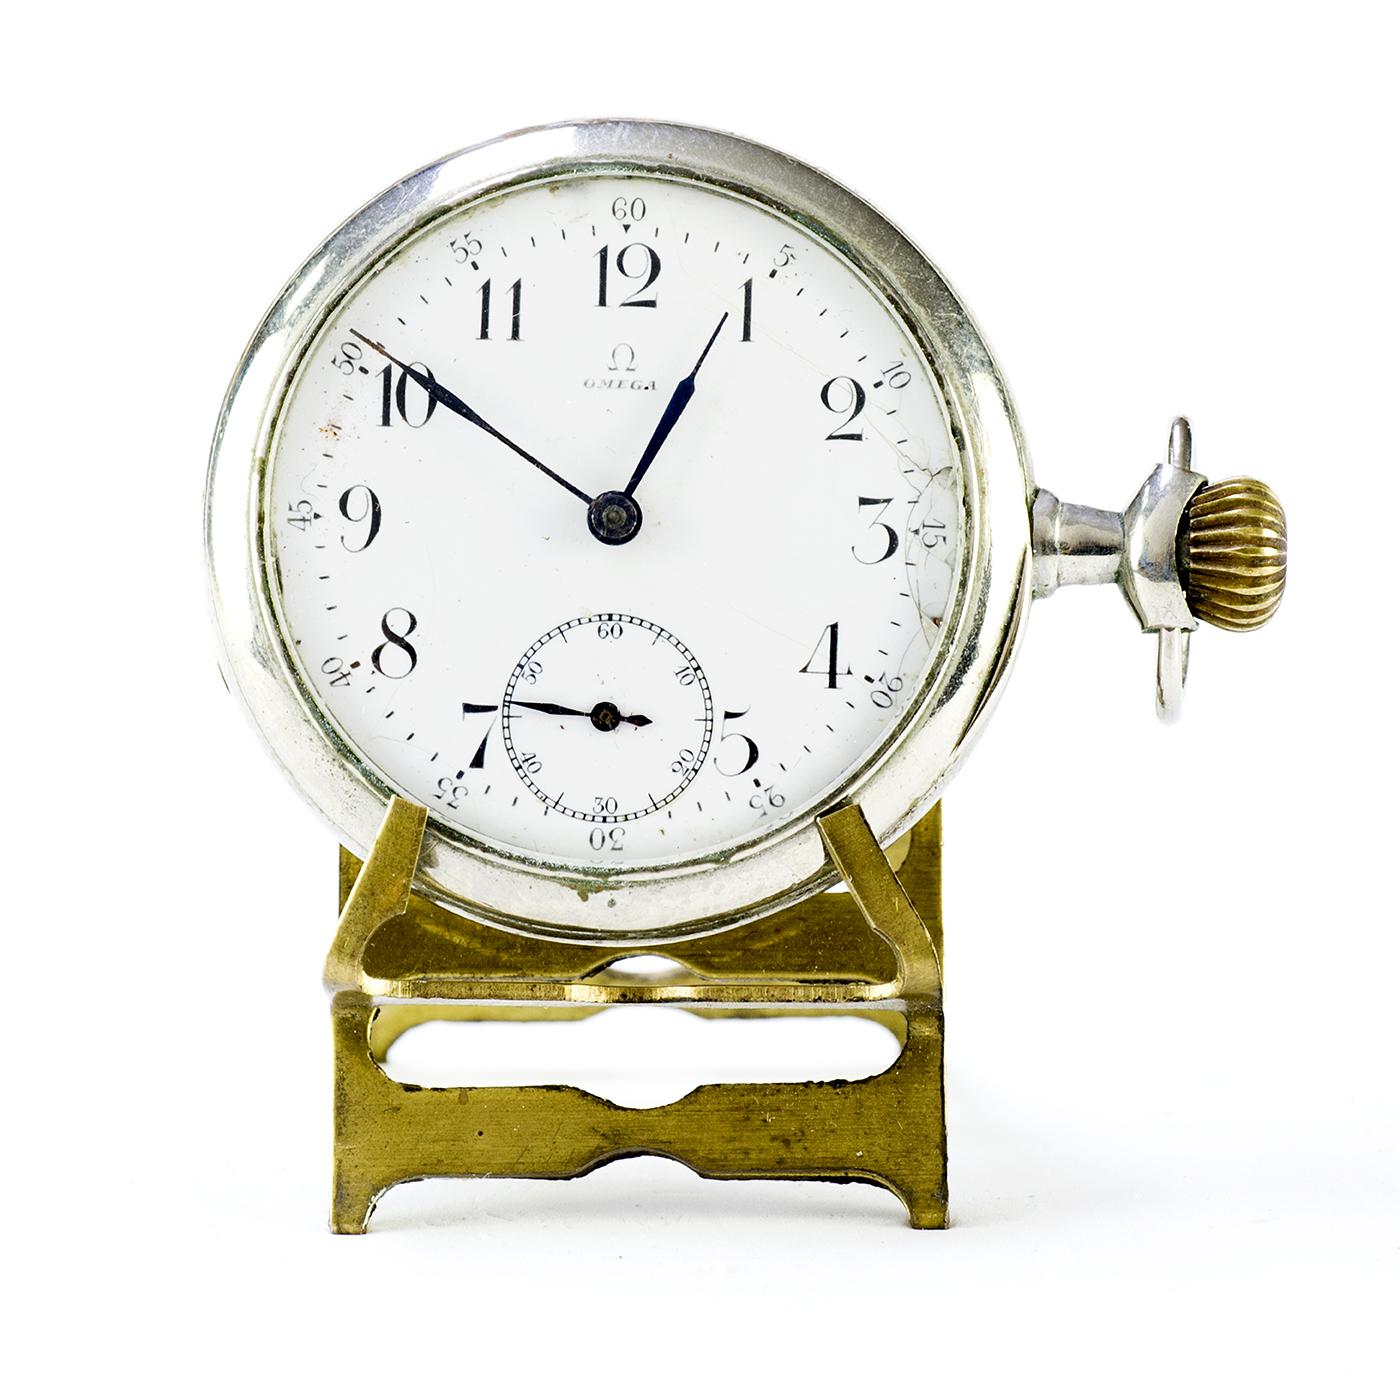 OMEGA. Reloj Suizo de Bolsillo, lepine y remontoir. Suiza, año 1916.